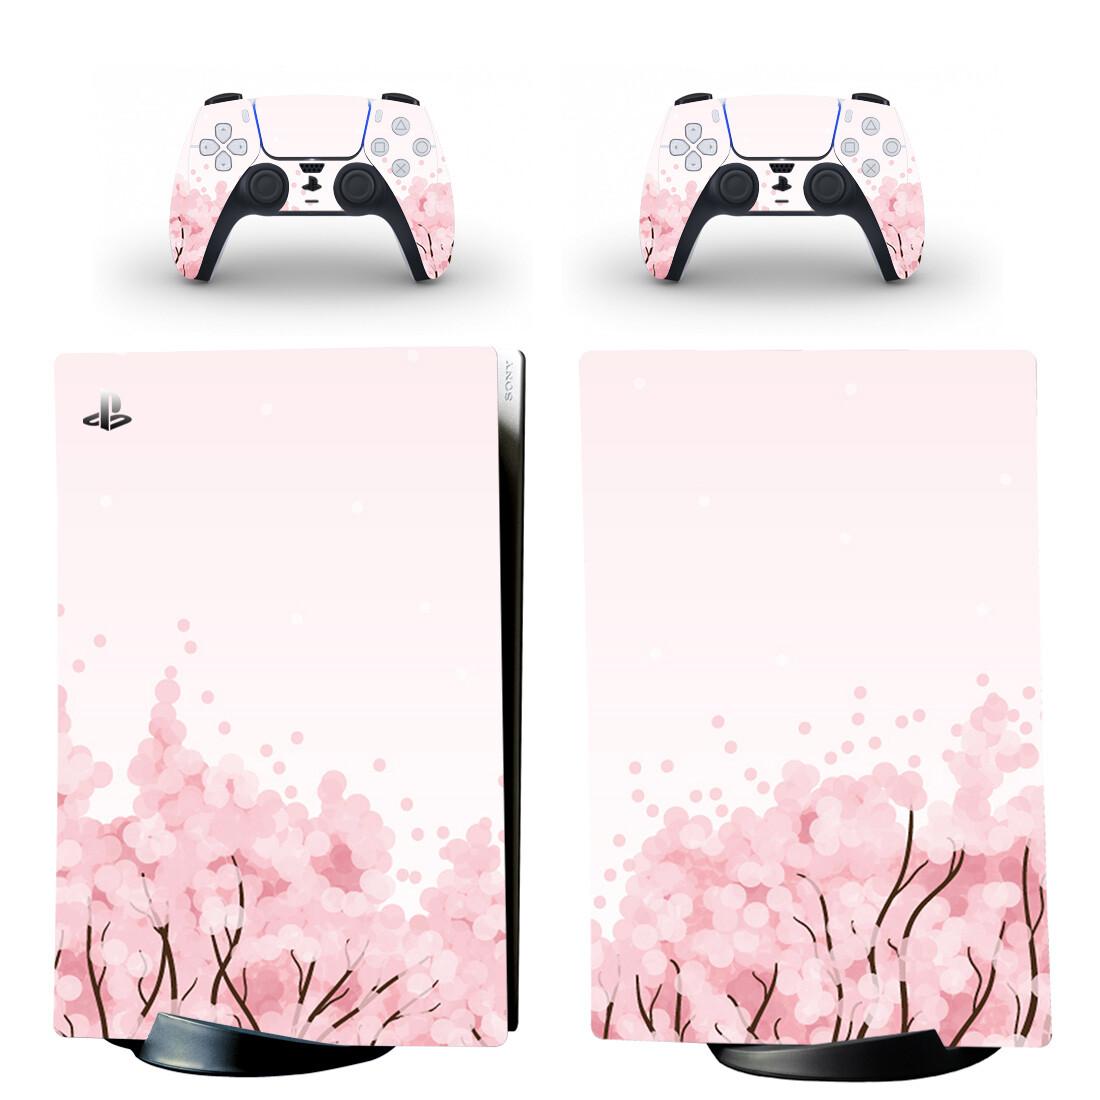 Sakura Haruno Cherry Blossom PS5 Digital Edition Skin Sticker Decal